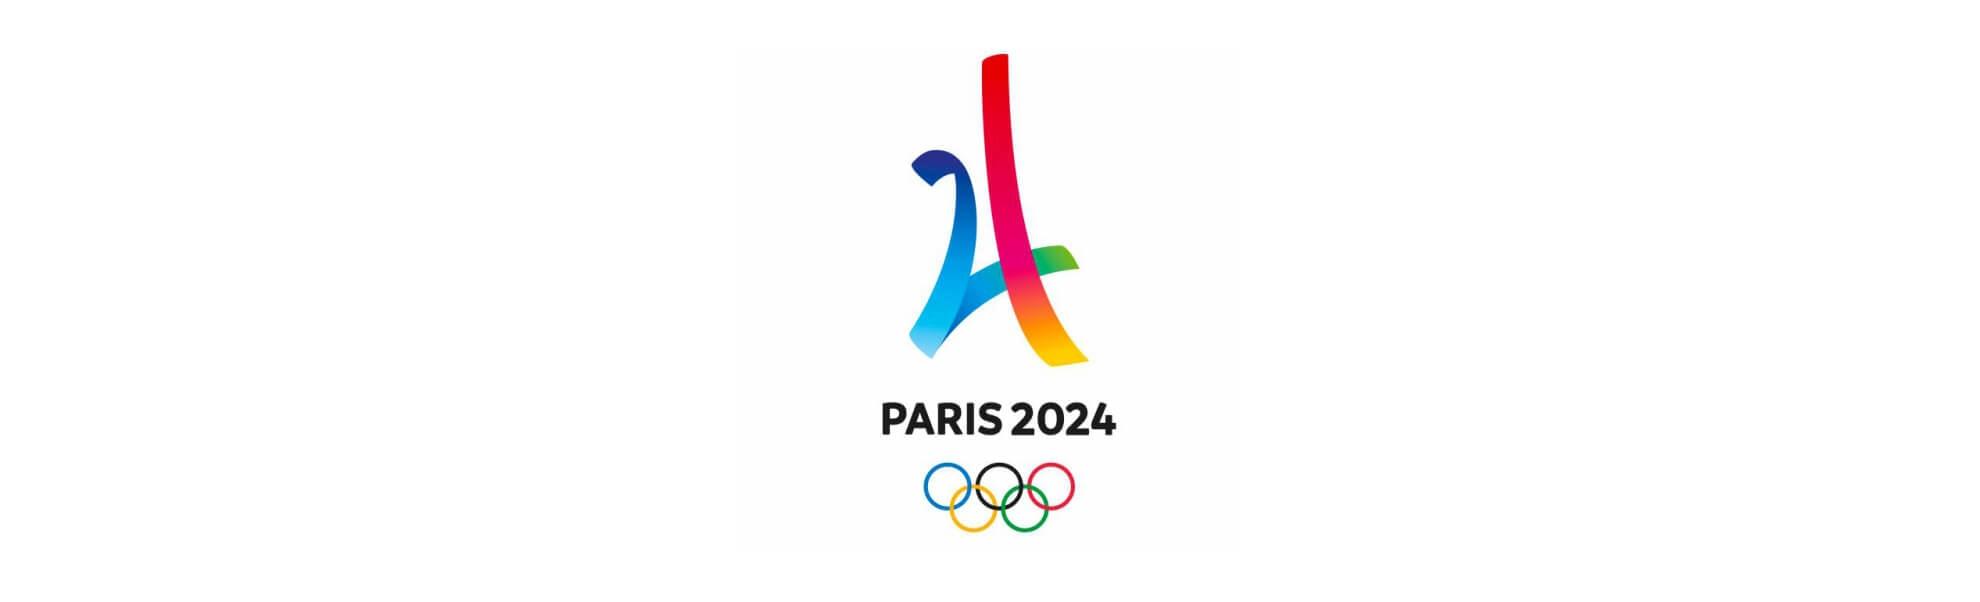 logo kandydackie Paris 2024